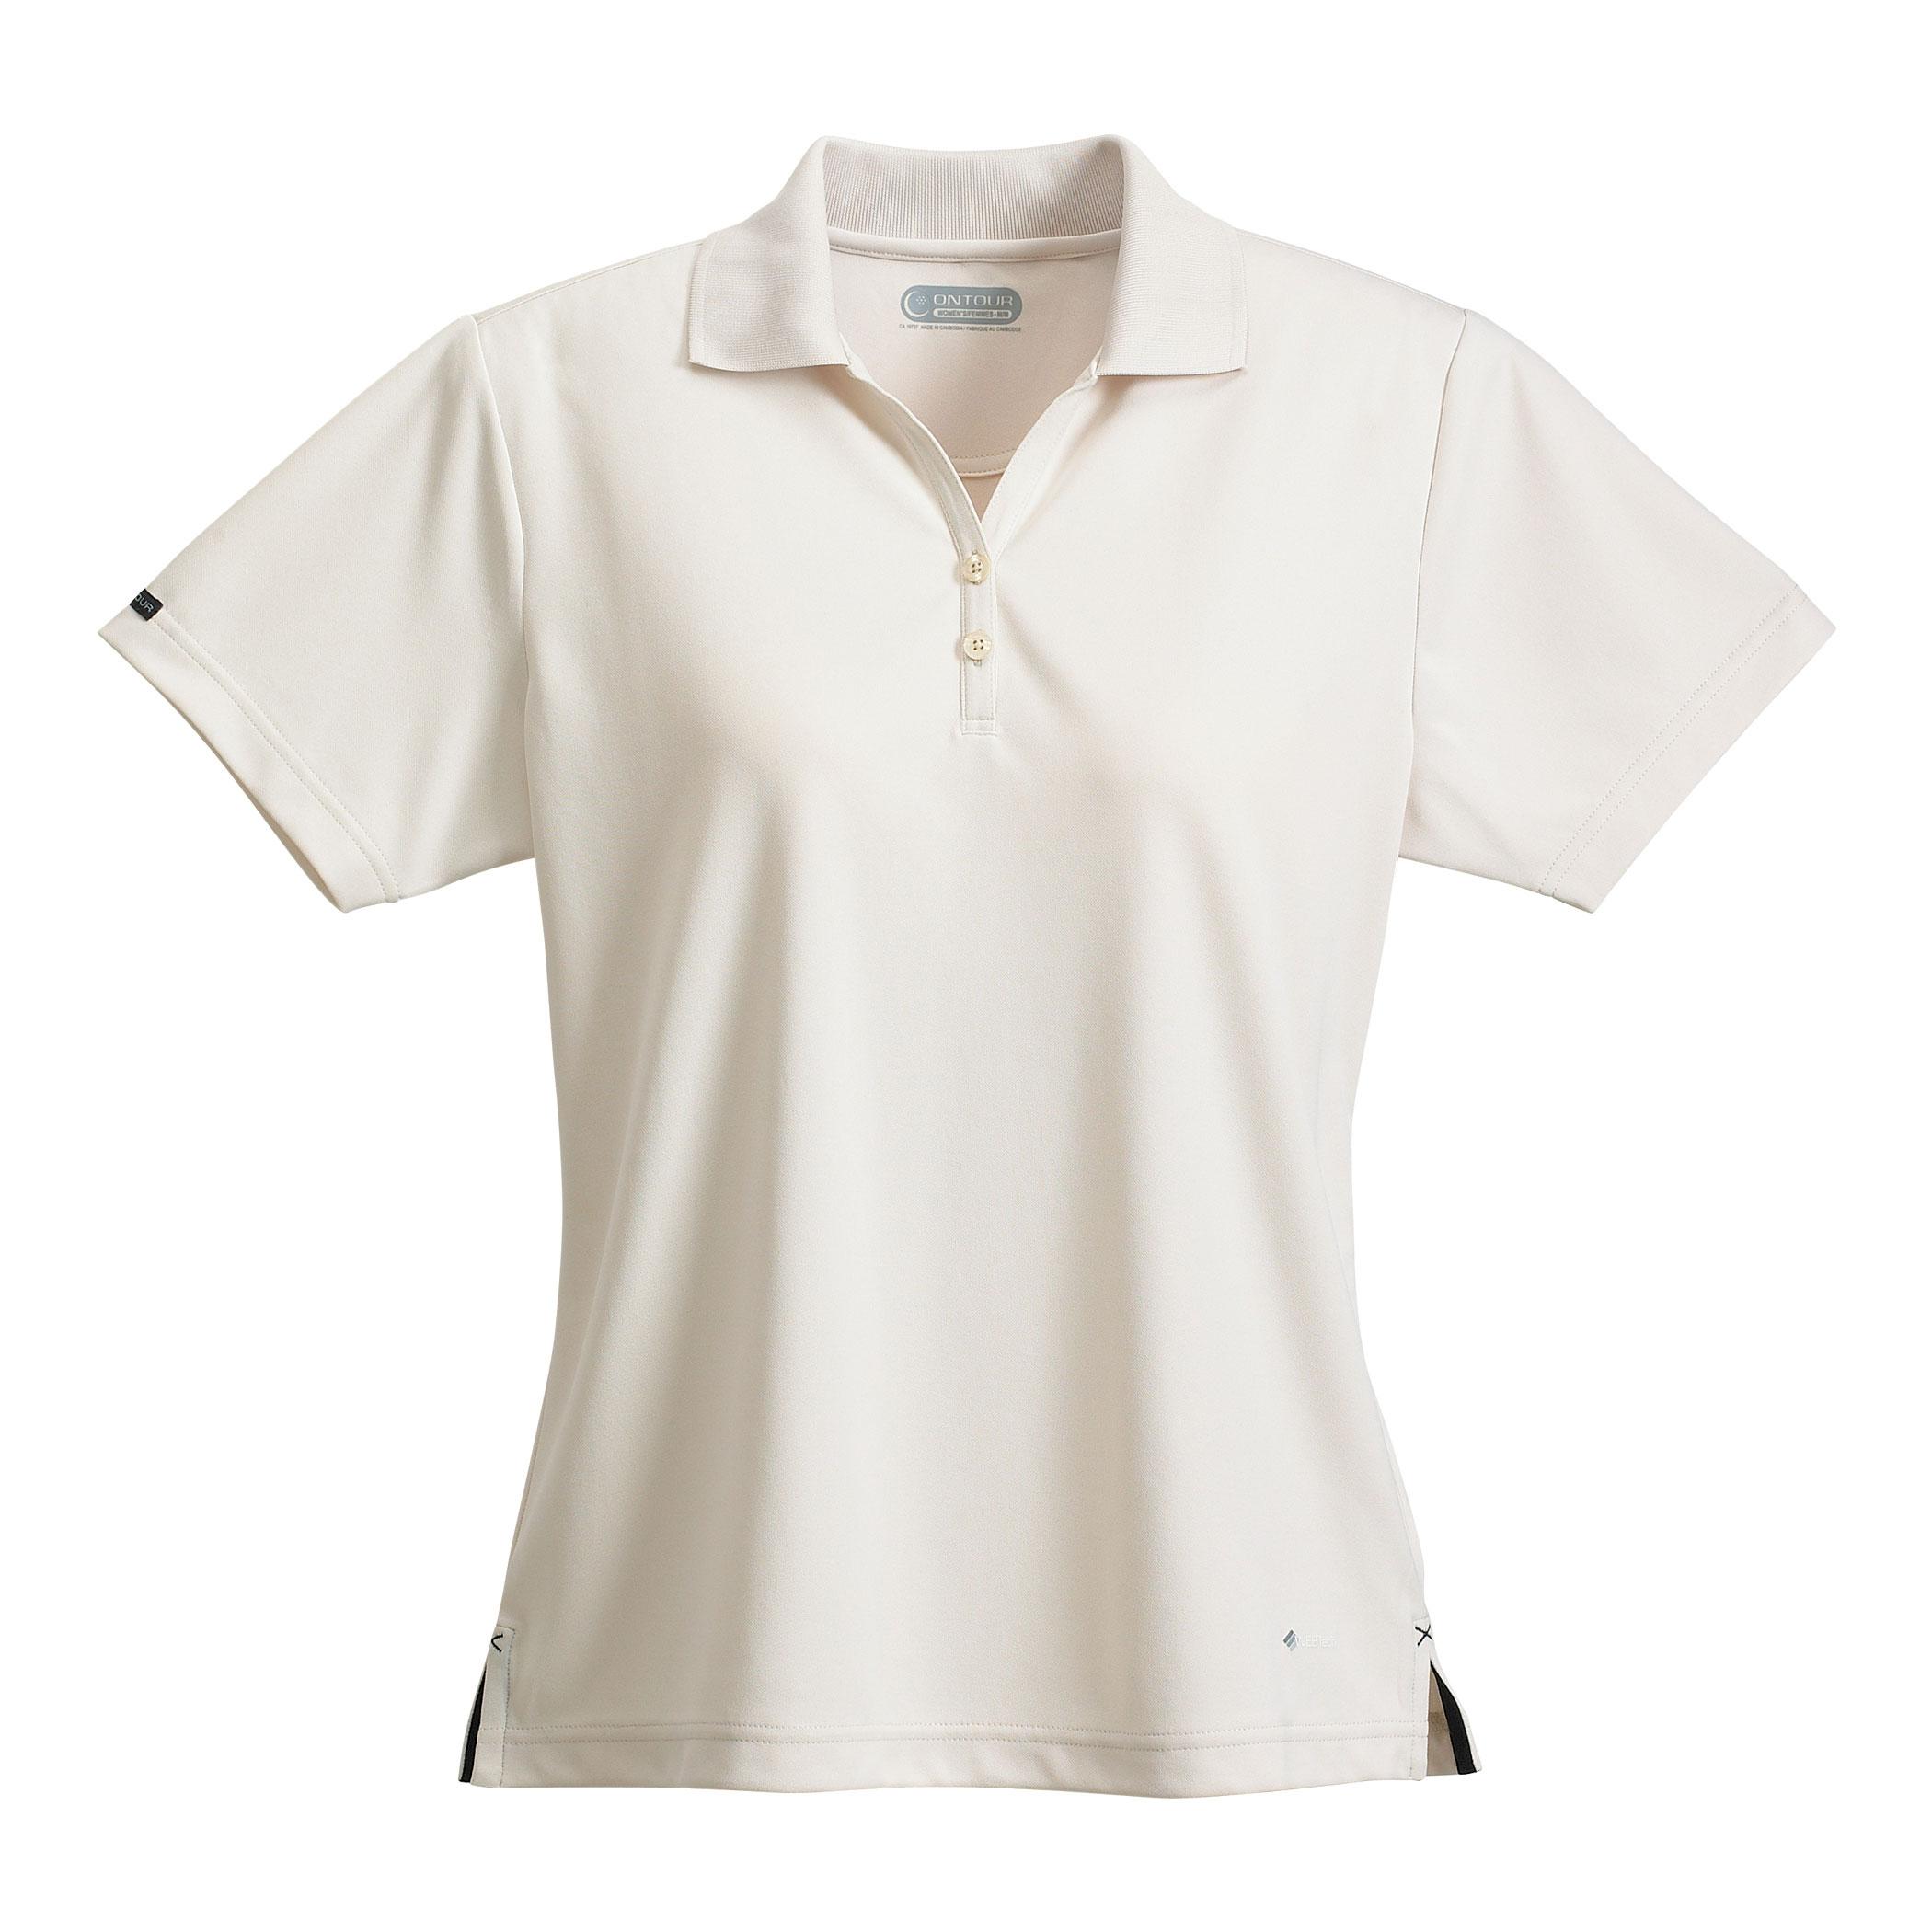 26b1d90f5dec6 W-MORENO TEXT MICRO SS POLO Trimark Sportswear Group